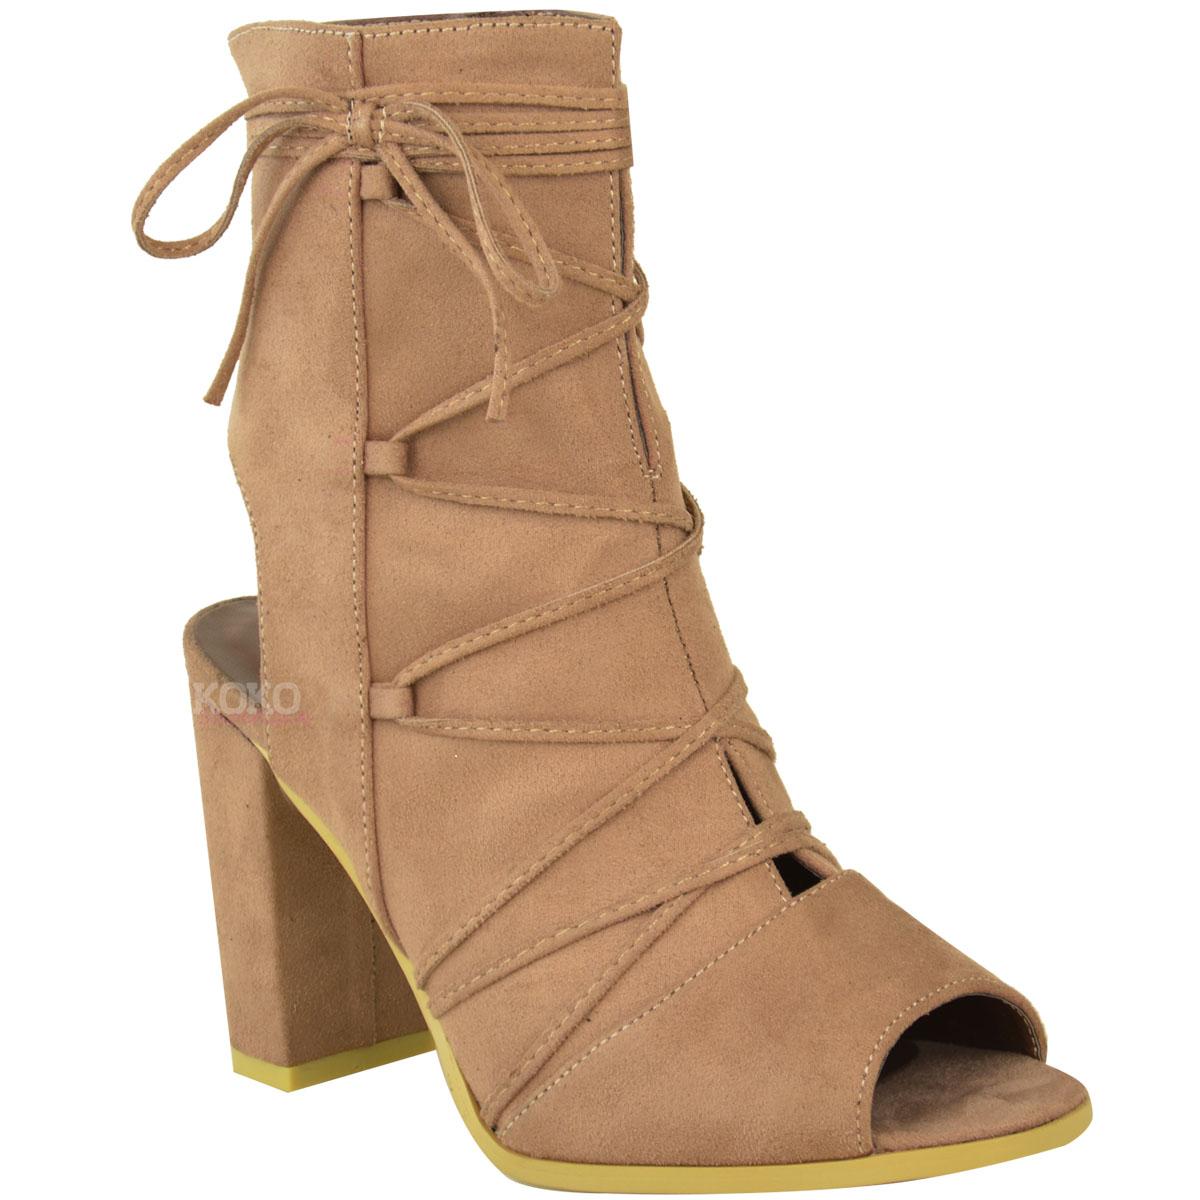 new womens block mid high heel open peep toe ankle